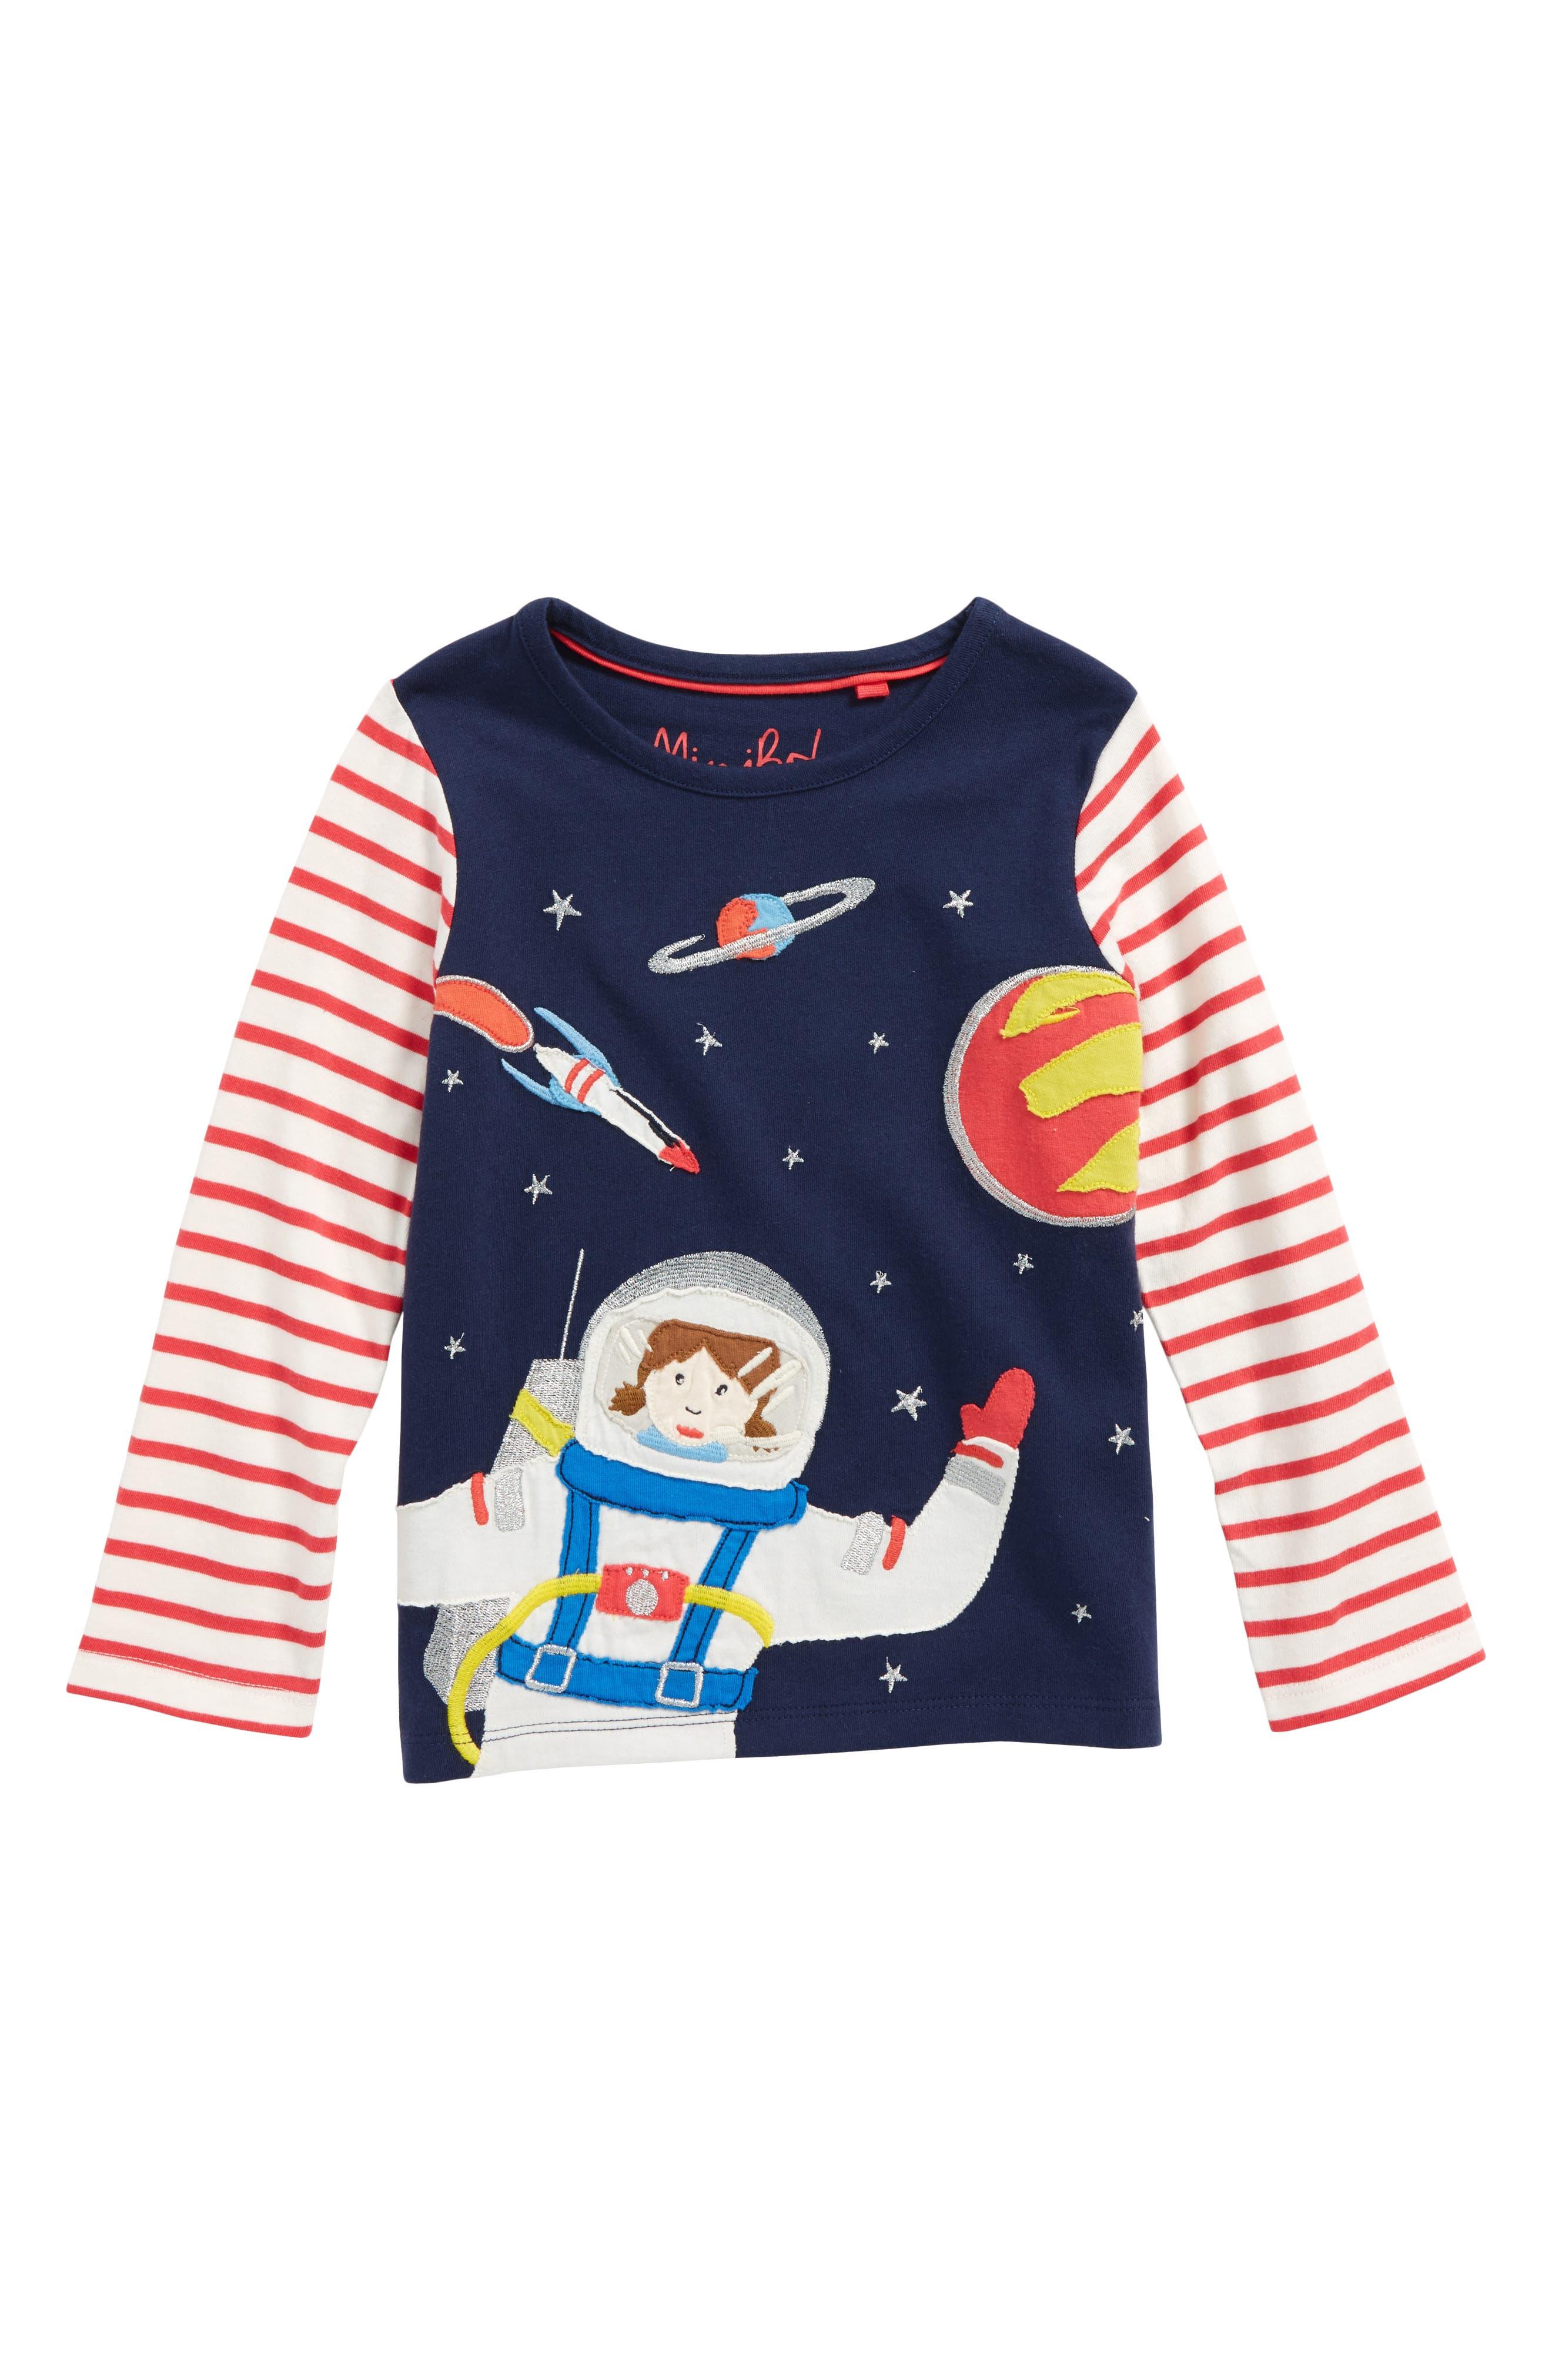 Space Girl Appliqué Tee,                         Main,                         color, School Navy